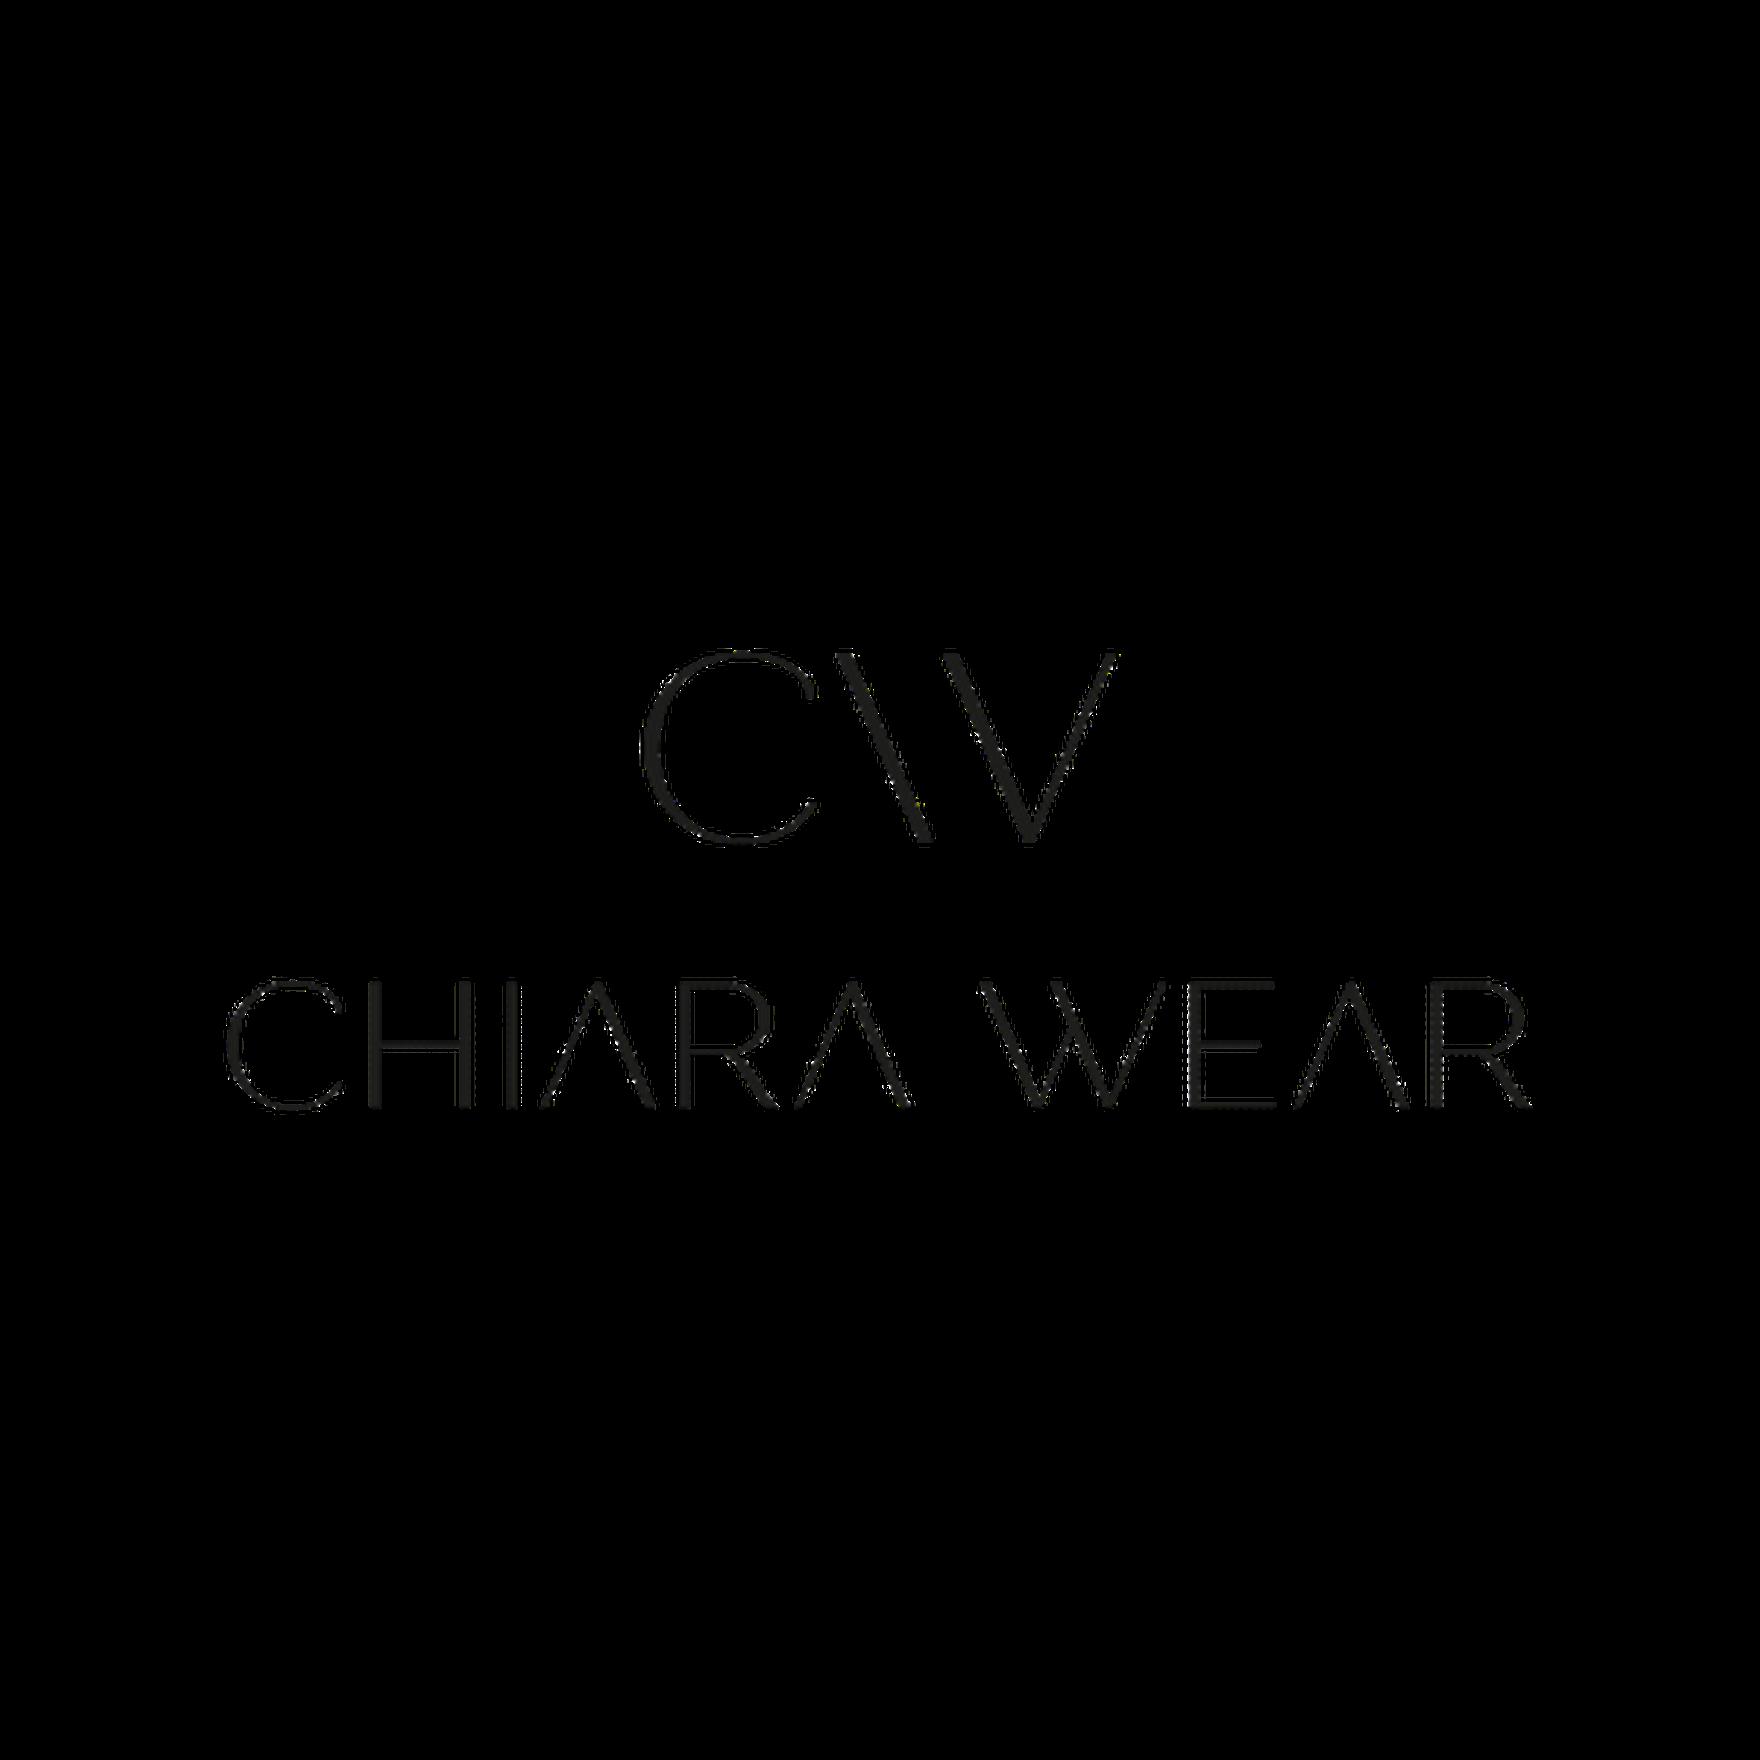 Chiarawear.com